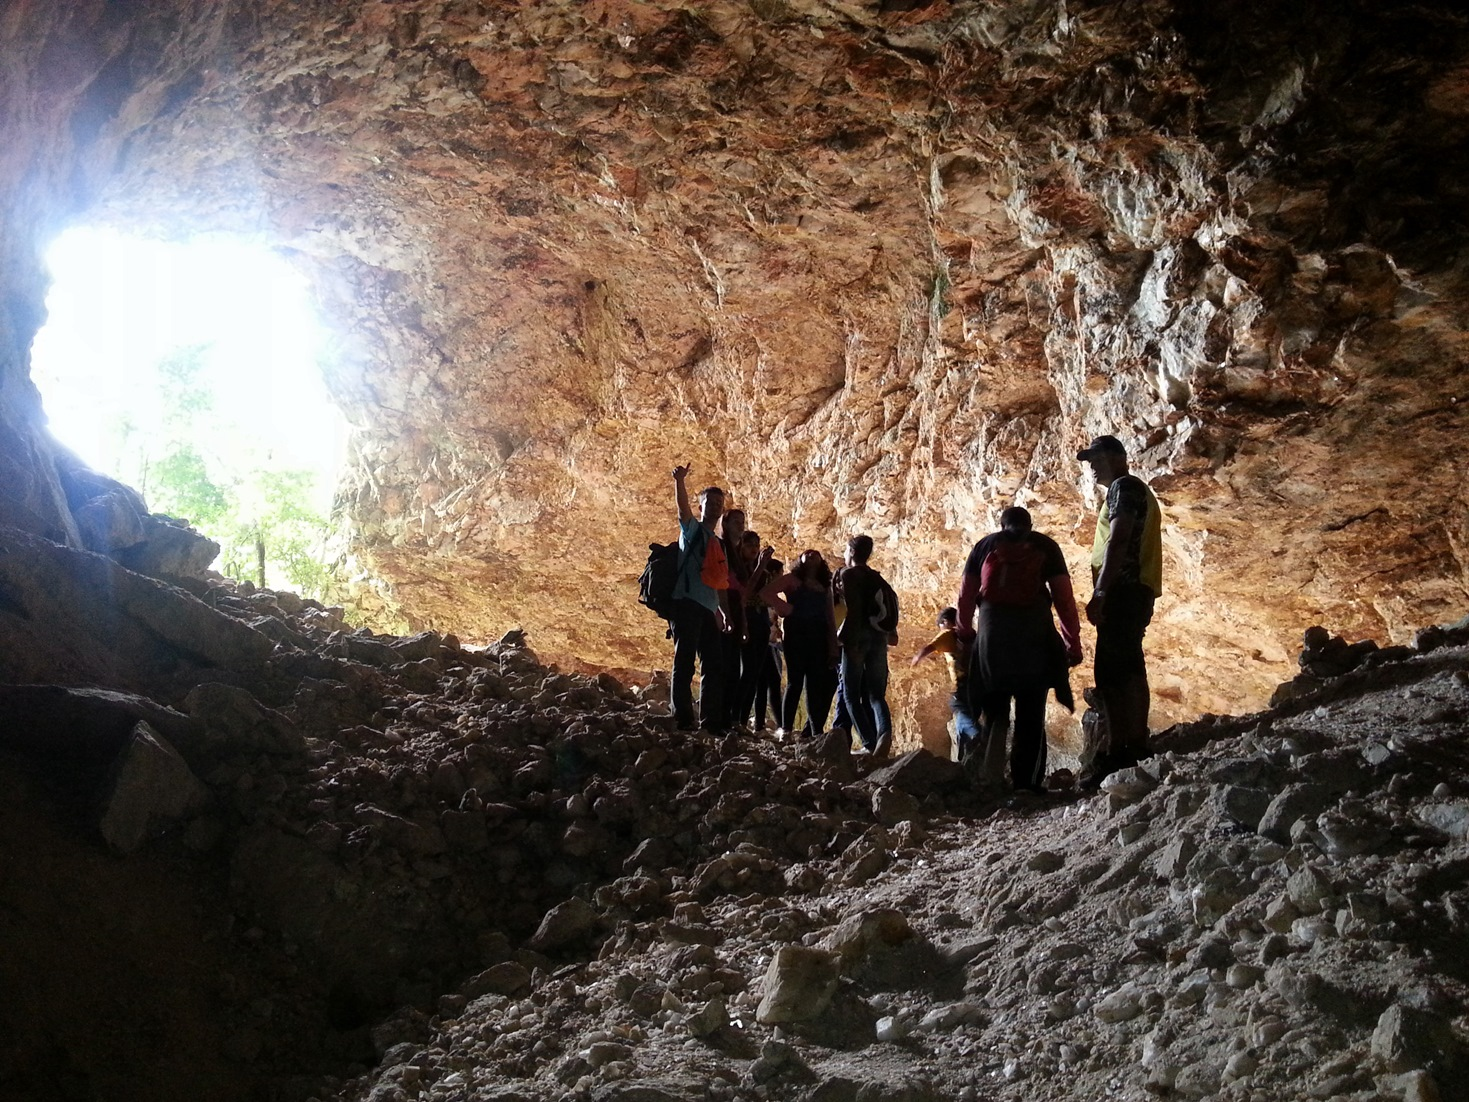 Maricá: Domingo haverá circuito ecológico nas grutas do Spar